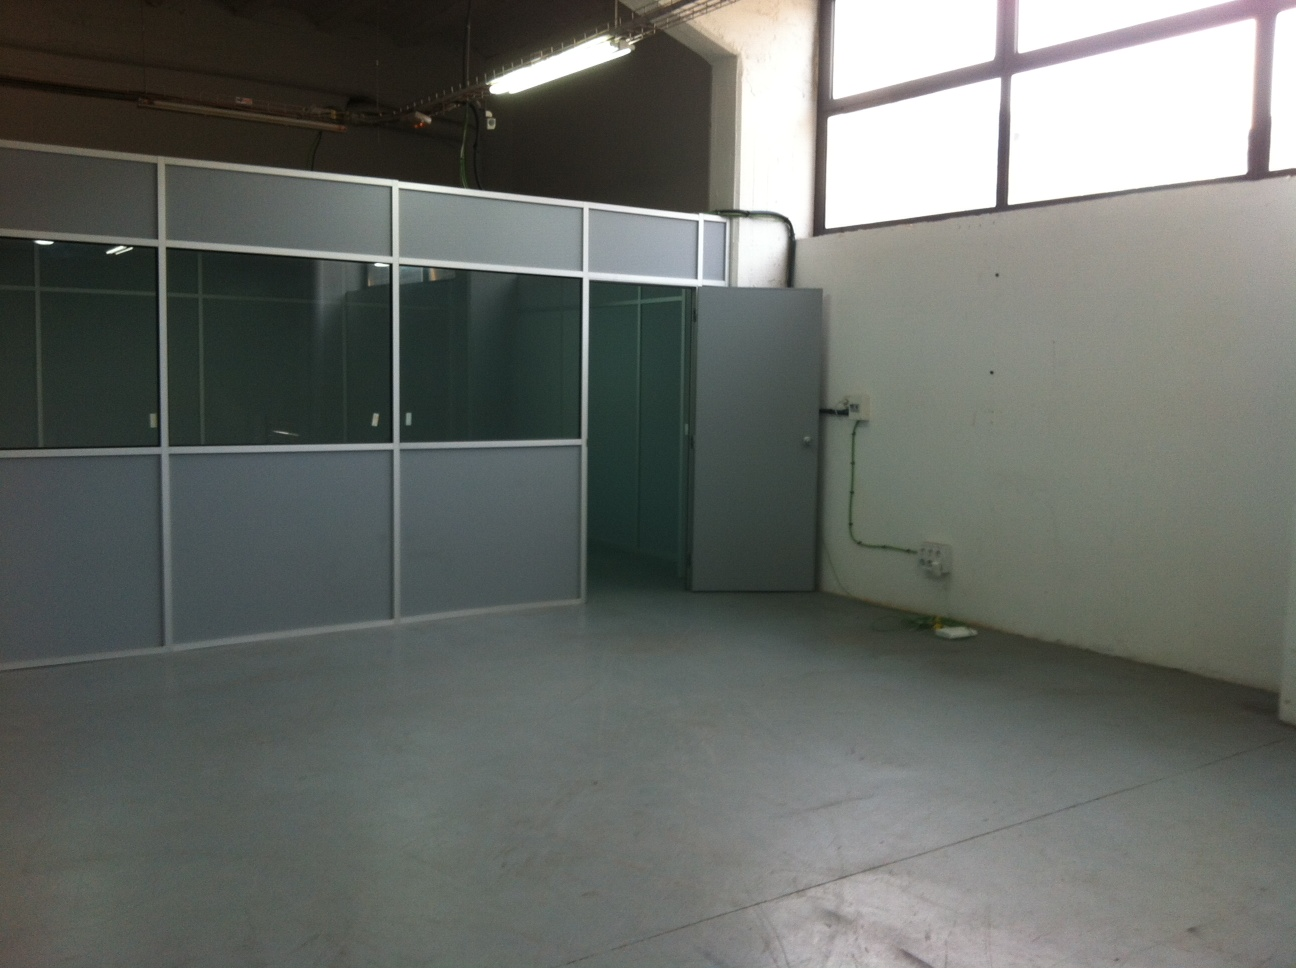 Lloguer Magatzem  Calle cellers, 179. Alquilo almacen con oficicina ideal stock! ultimo disponible!!!